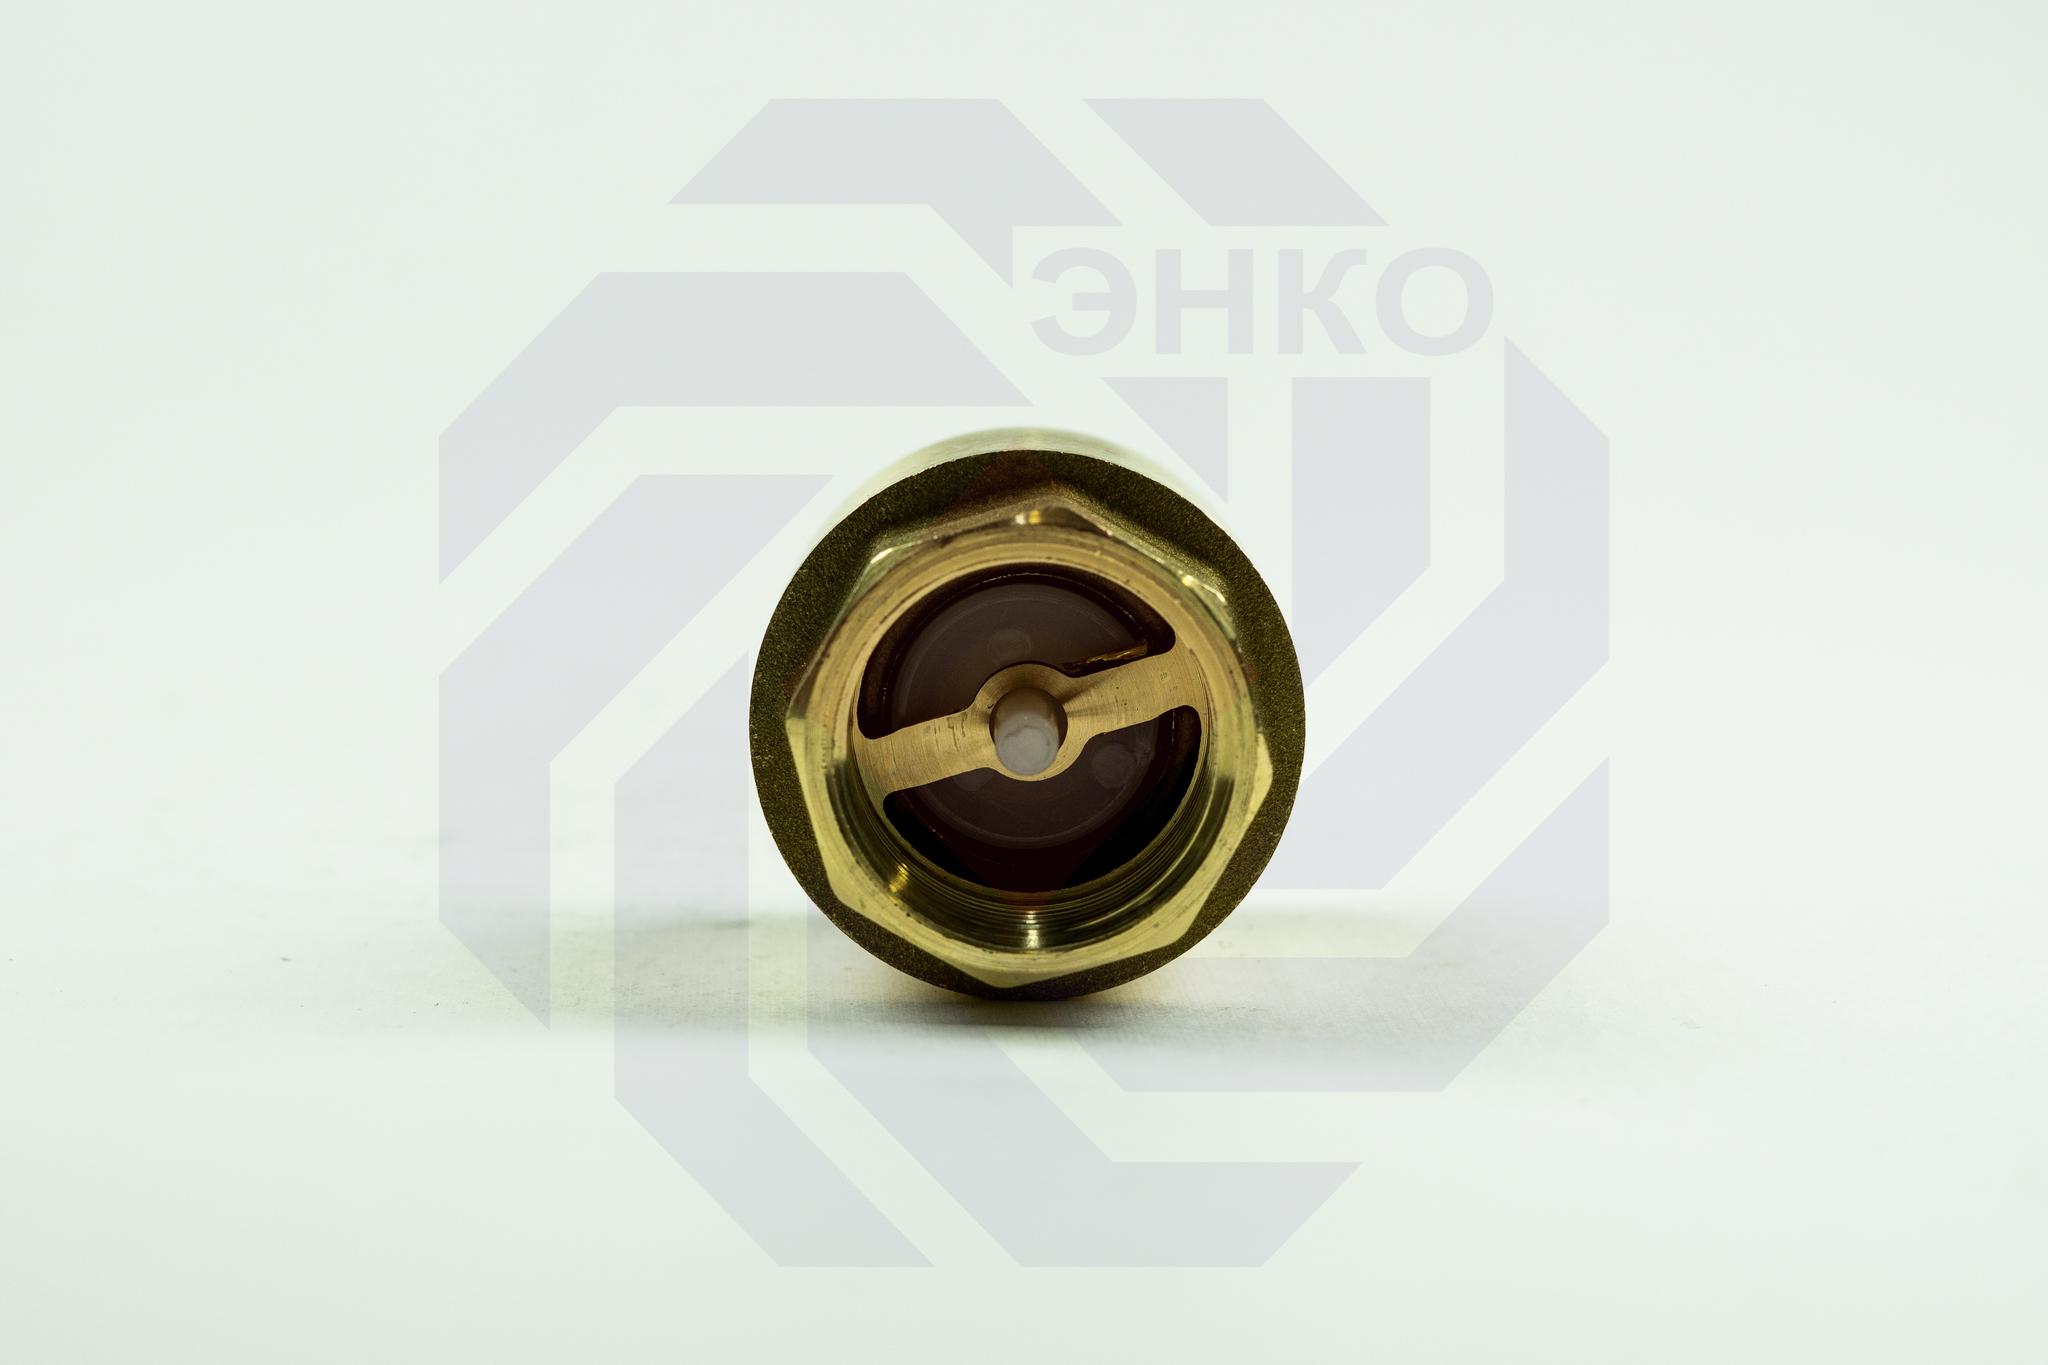 Клапан обратный ВР/ВР BUGATTI EURO 1000 1